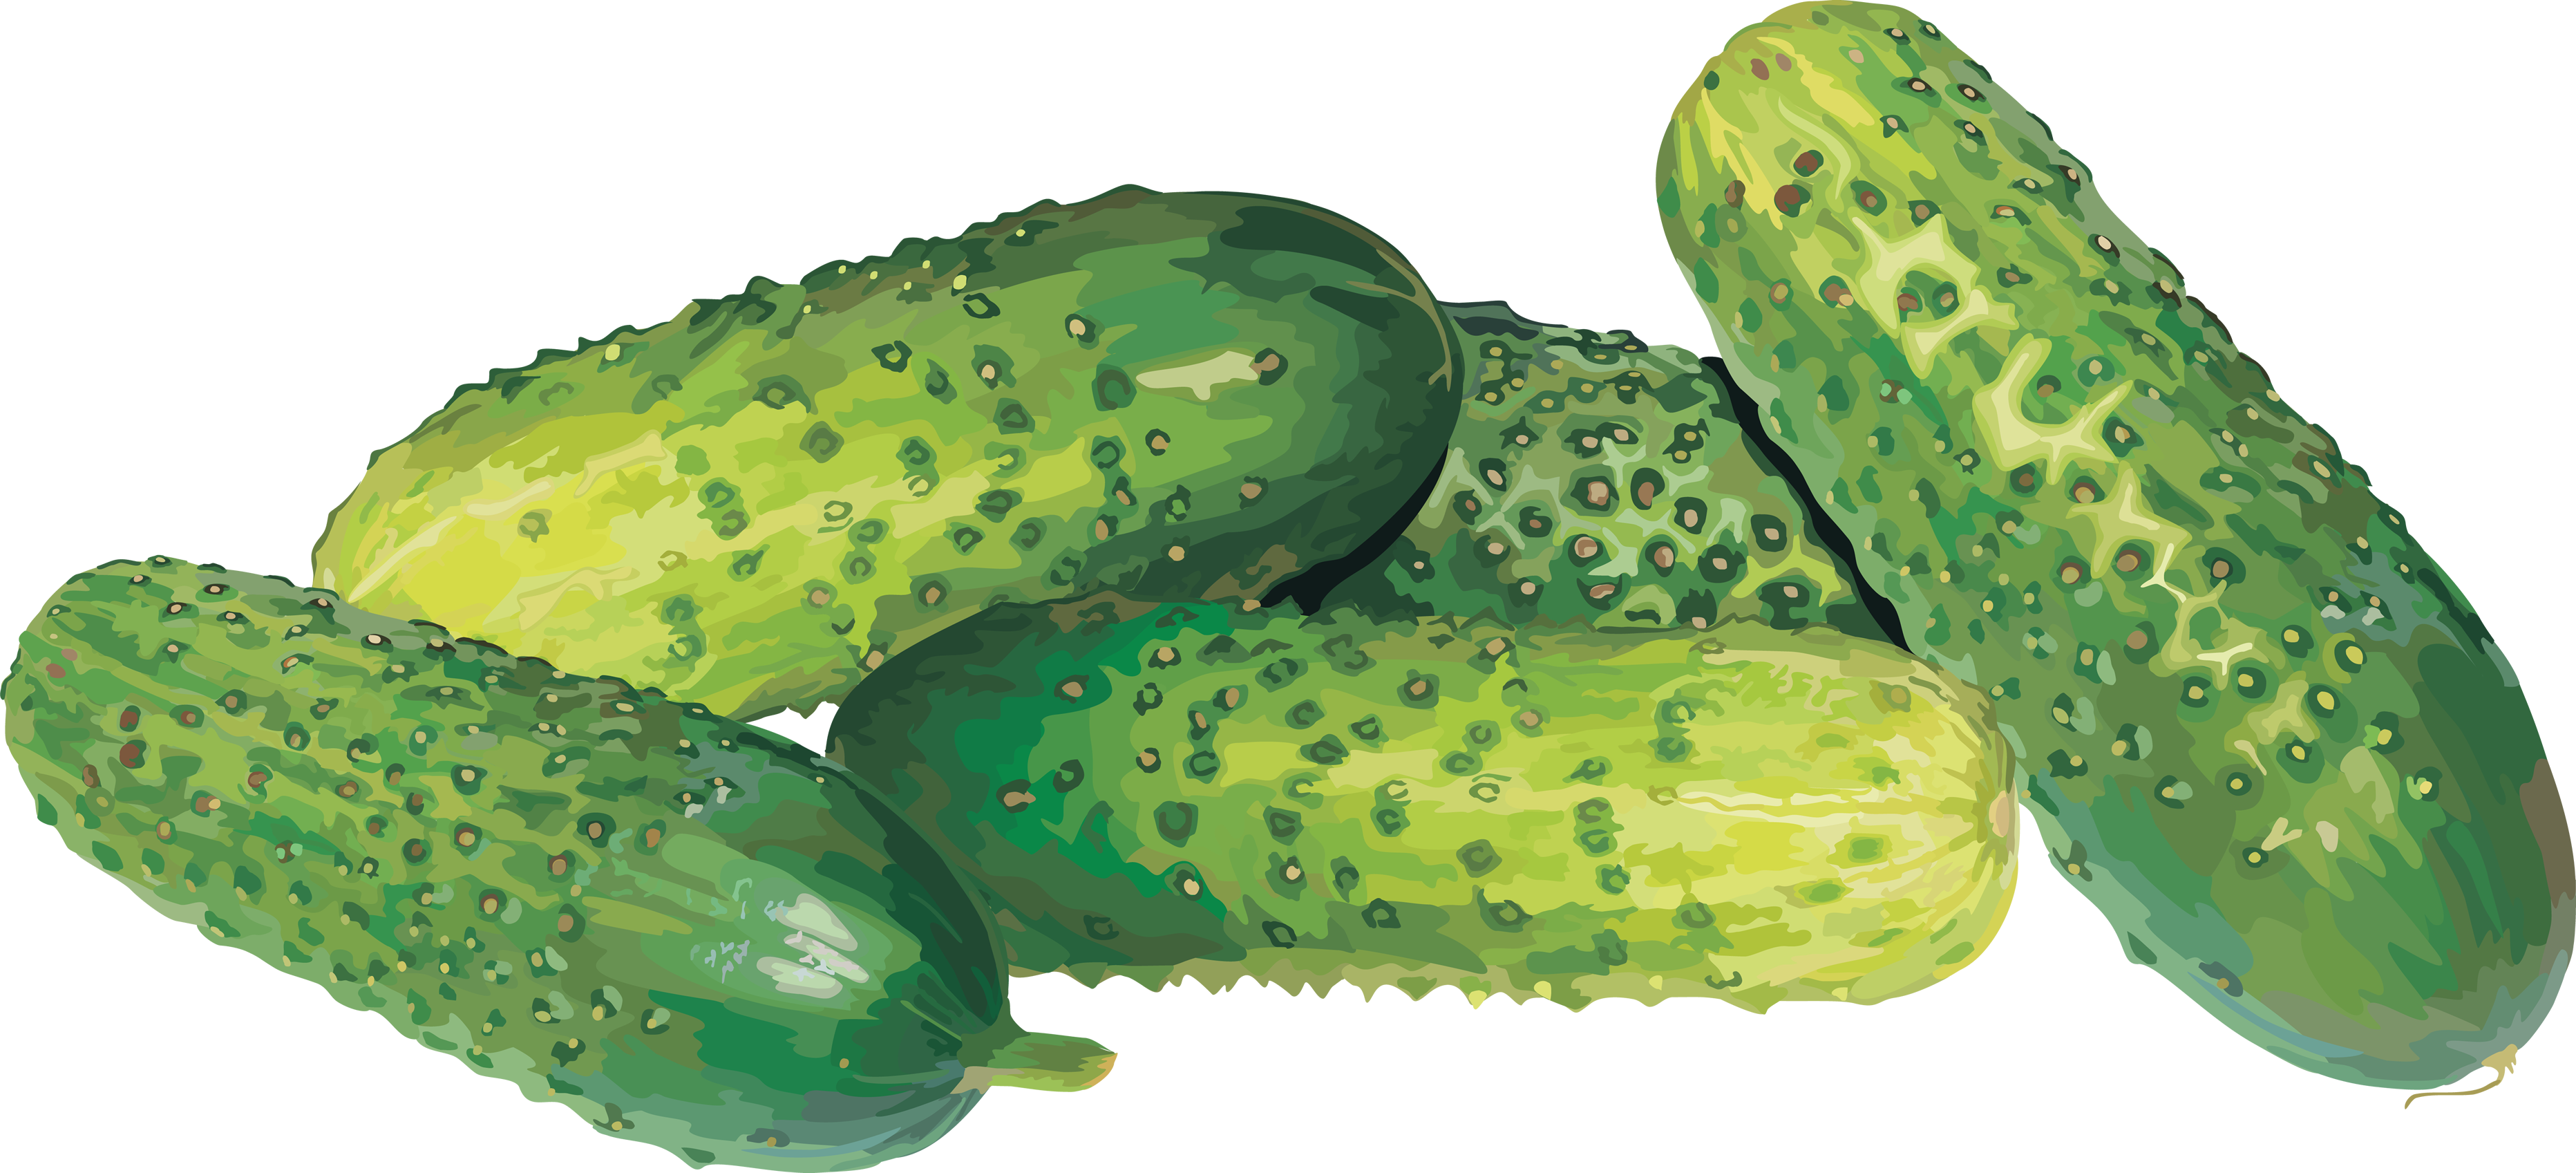 Twenty seven isolated stock. Vegetables clipart cucumber